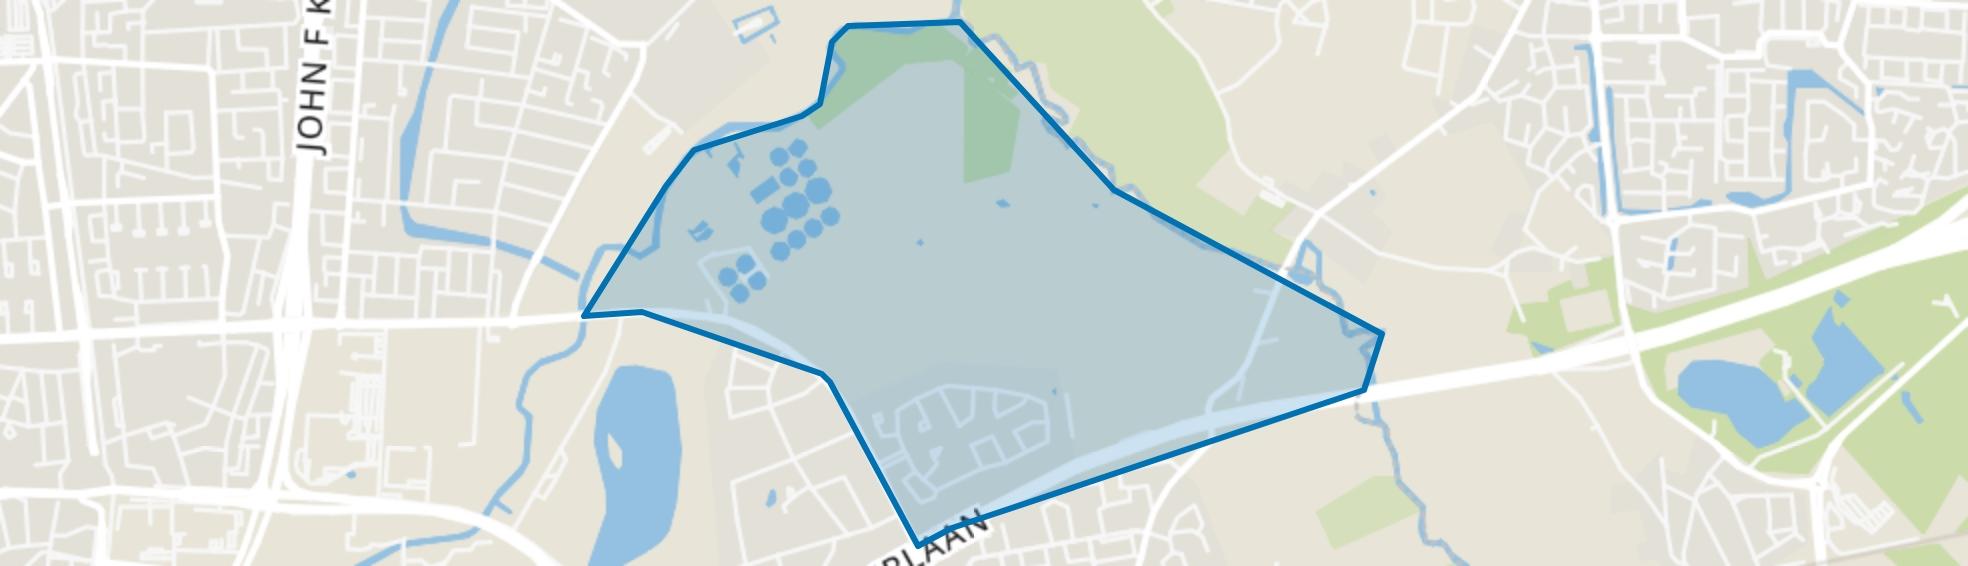 Koudenhoven, Eindhoven map